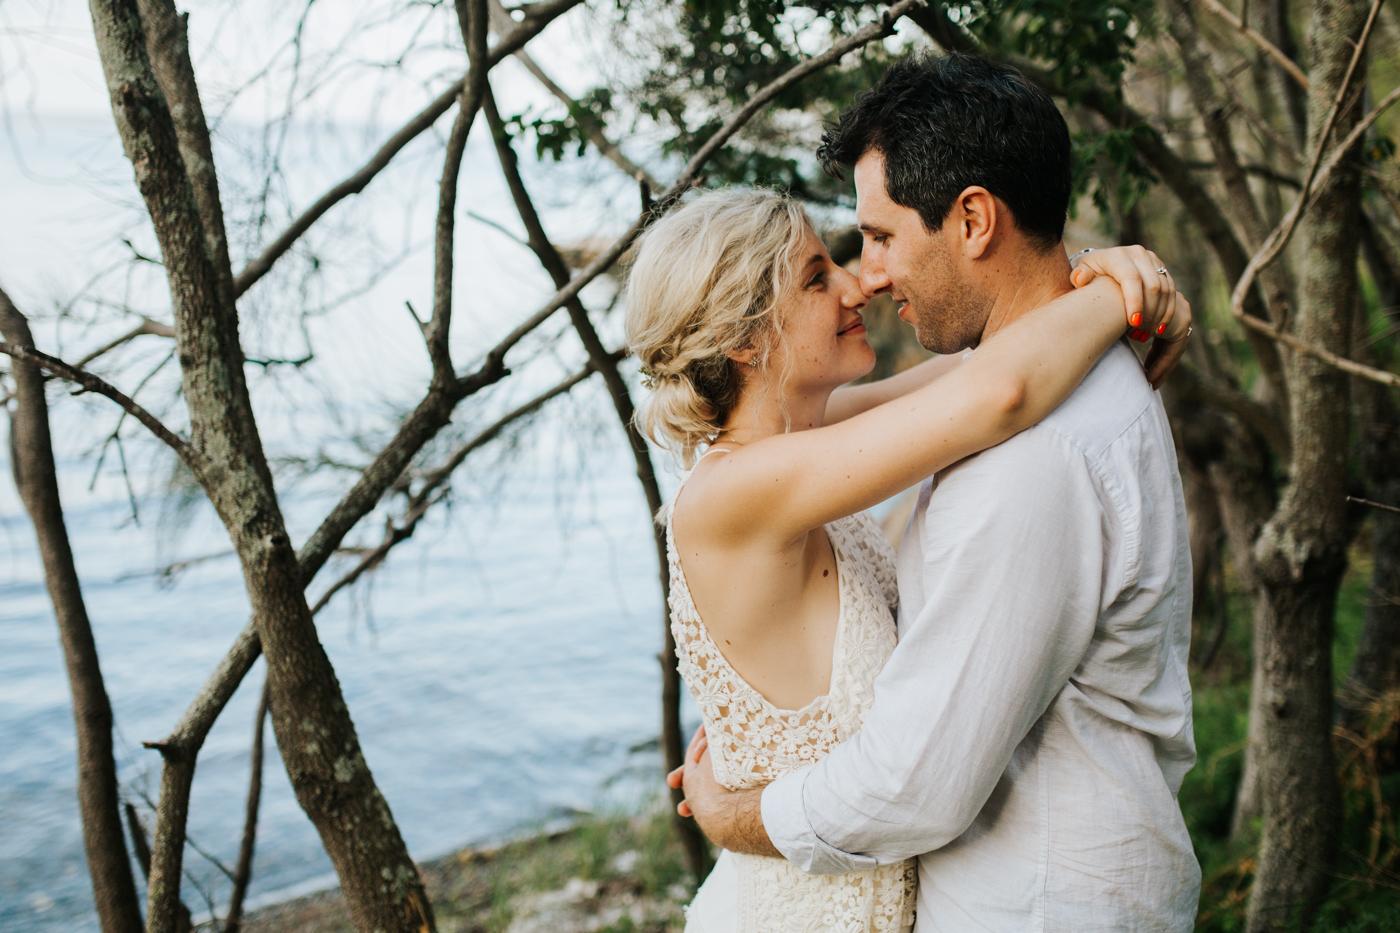 Emma & Ben - Lake Macquarie - Hunter Valley Wedding - Samantha Heather Photography-205.jpg